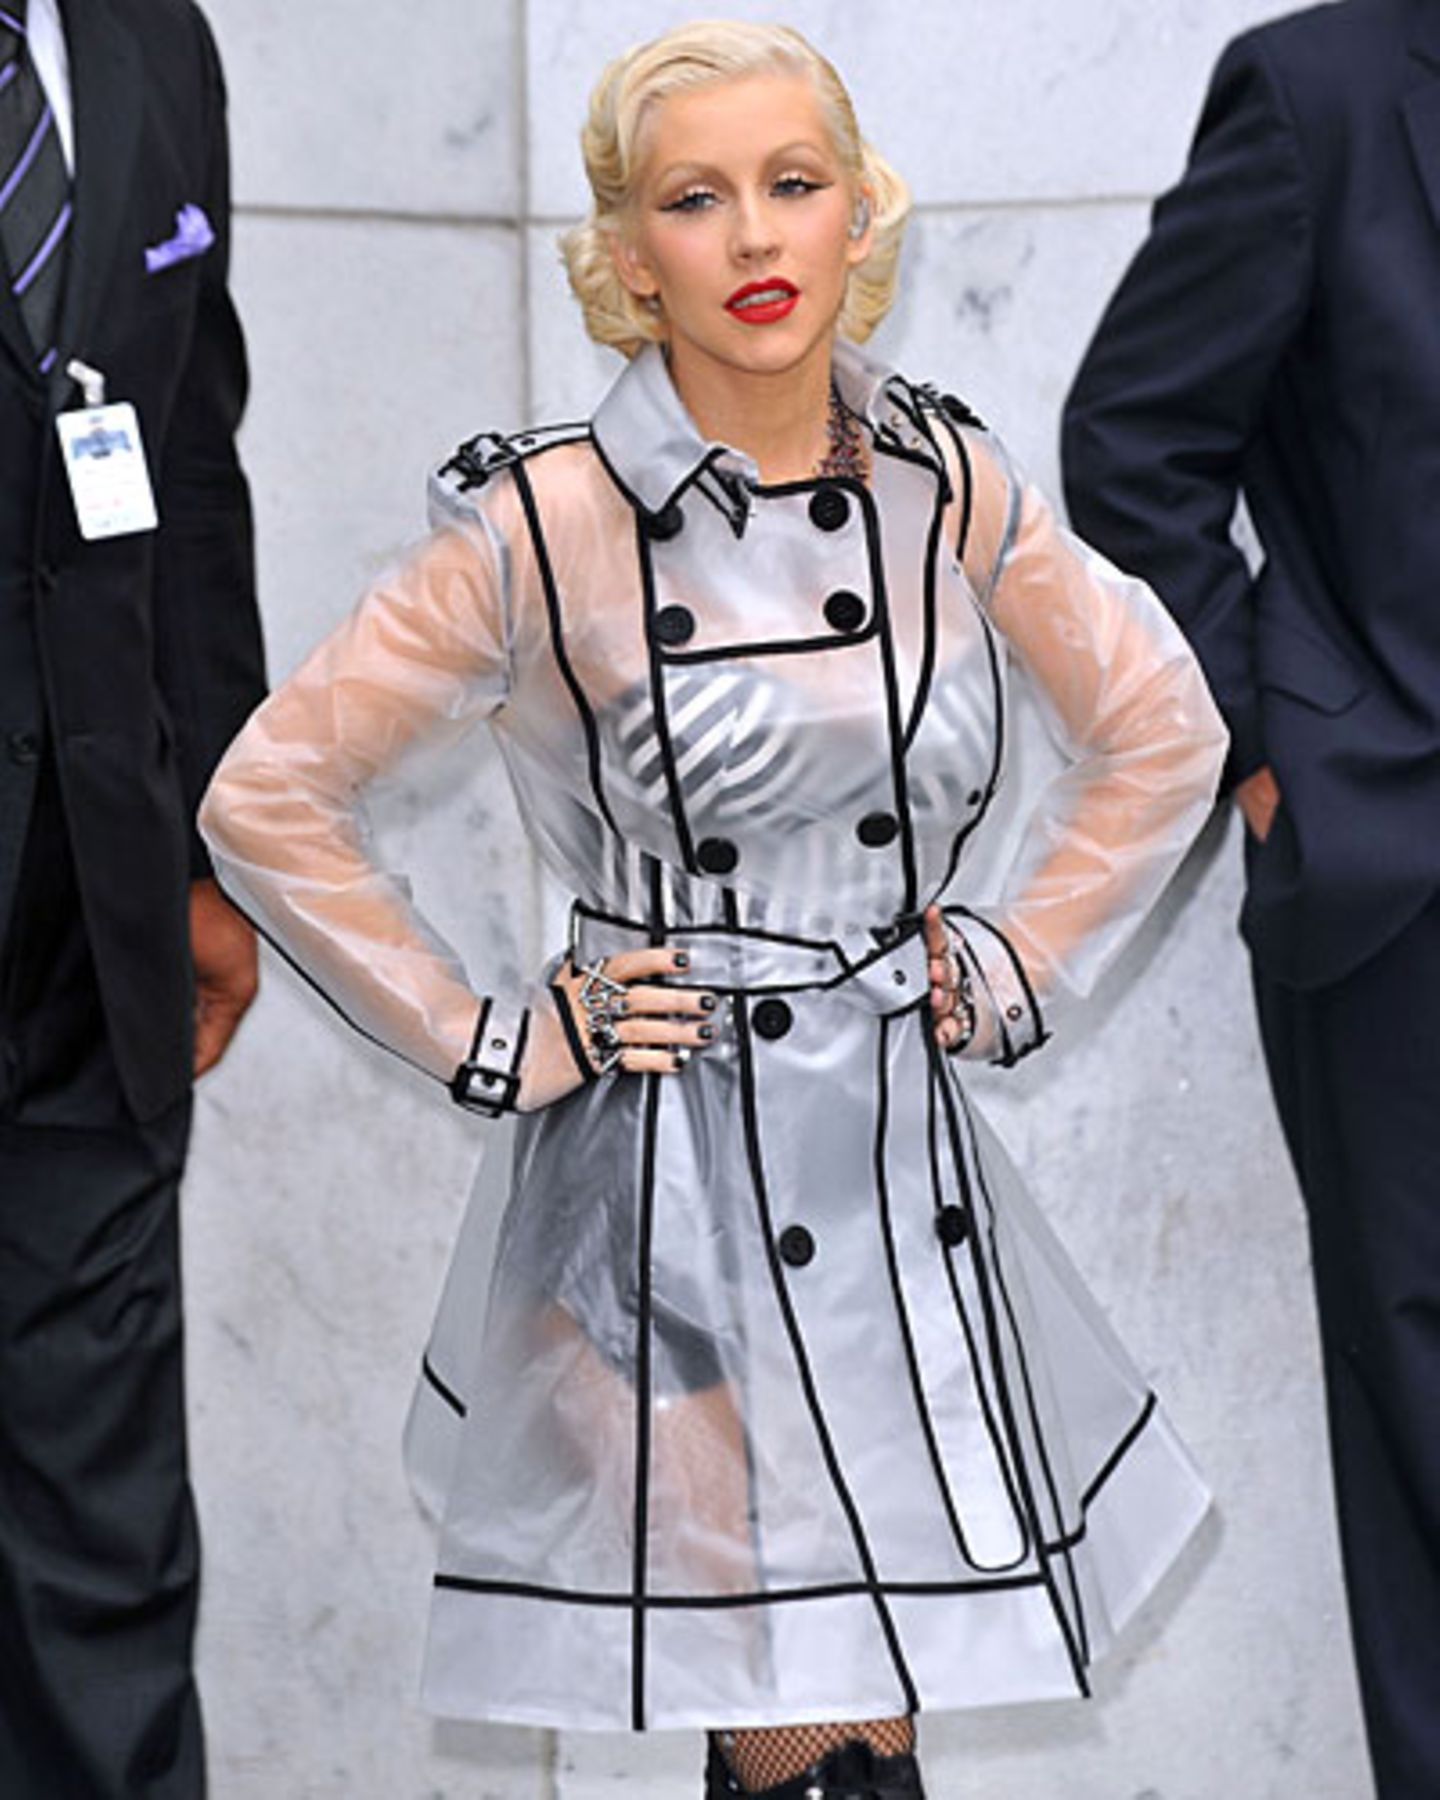 Promi-Looks: Christina Aguilera posiert